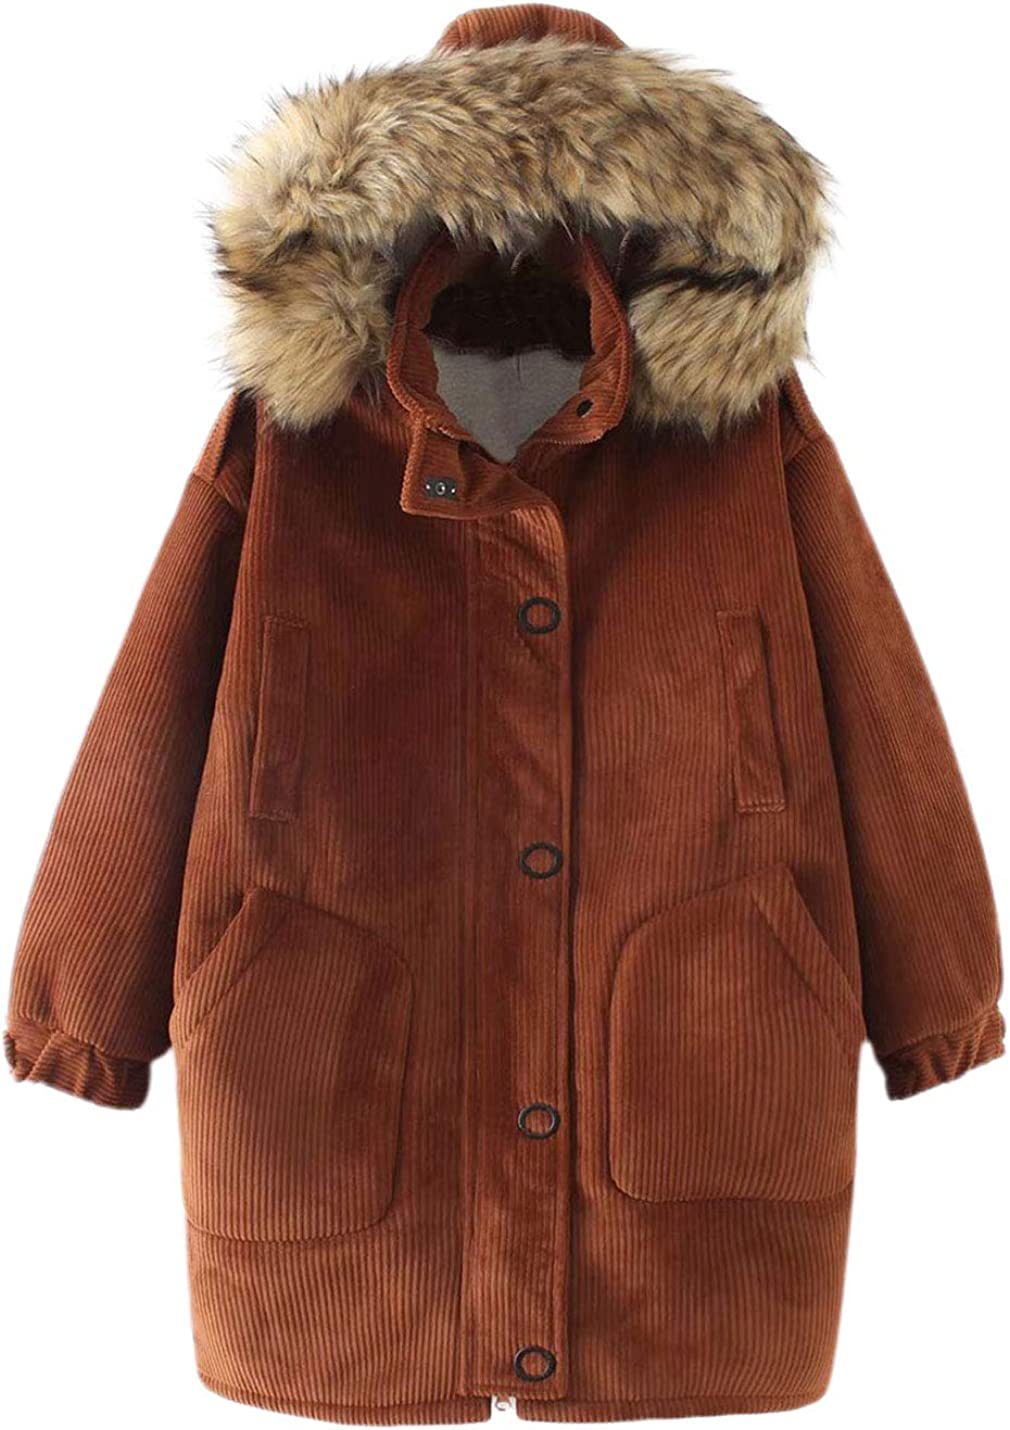 Lentta Womens Casual Loose Thicken Corduroy Fur Neck Trim Hoodie Mid Long Parkas